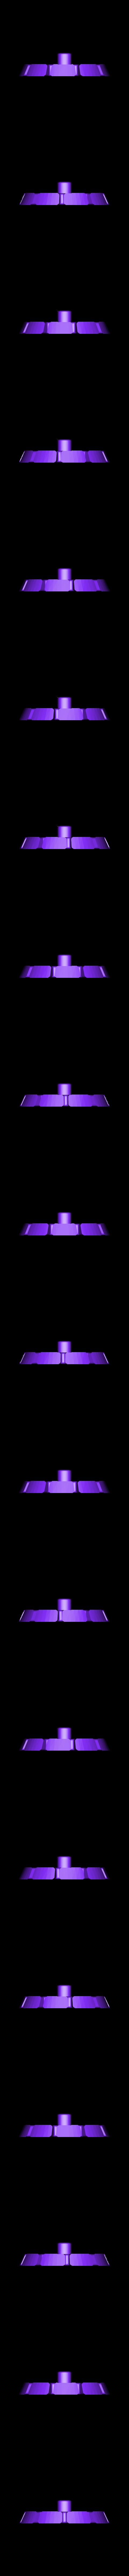 Pièce3.STL Download STL file HELP CUTTING CAKE PART CUTTING • 3D printer object, GuilhemPerroud